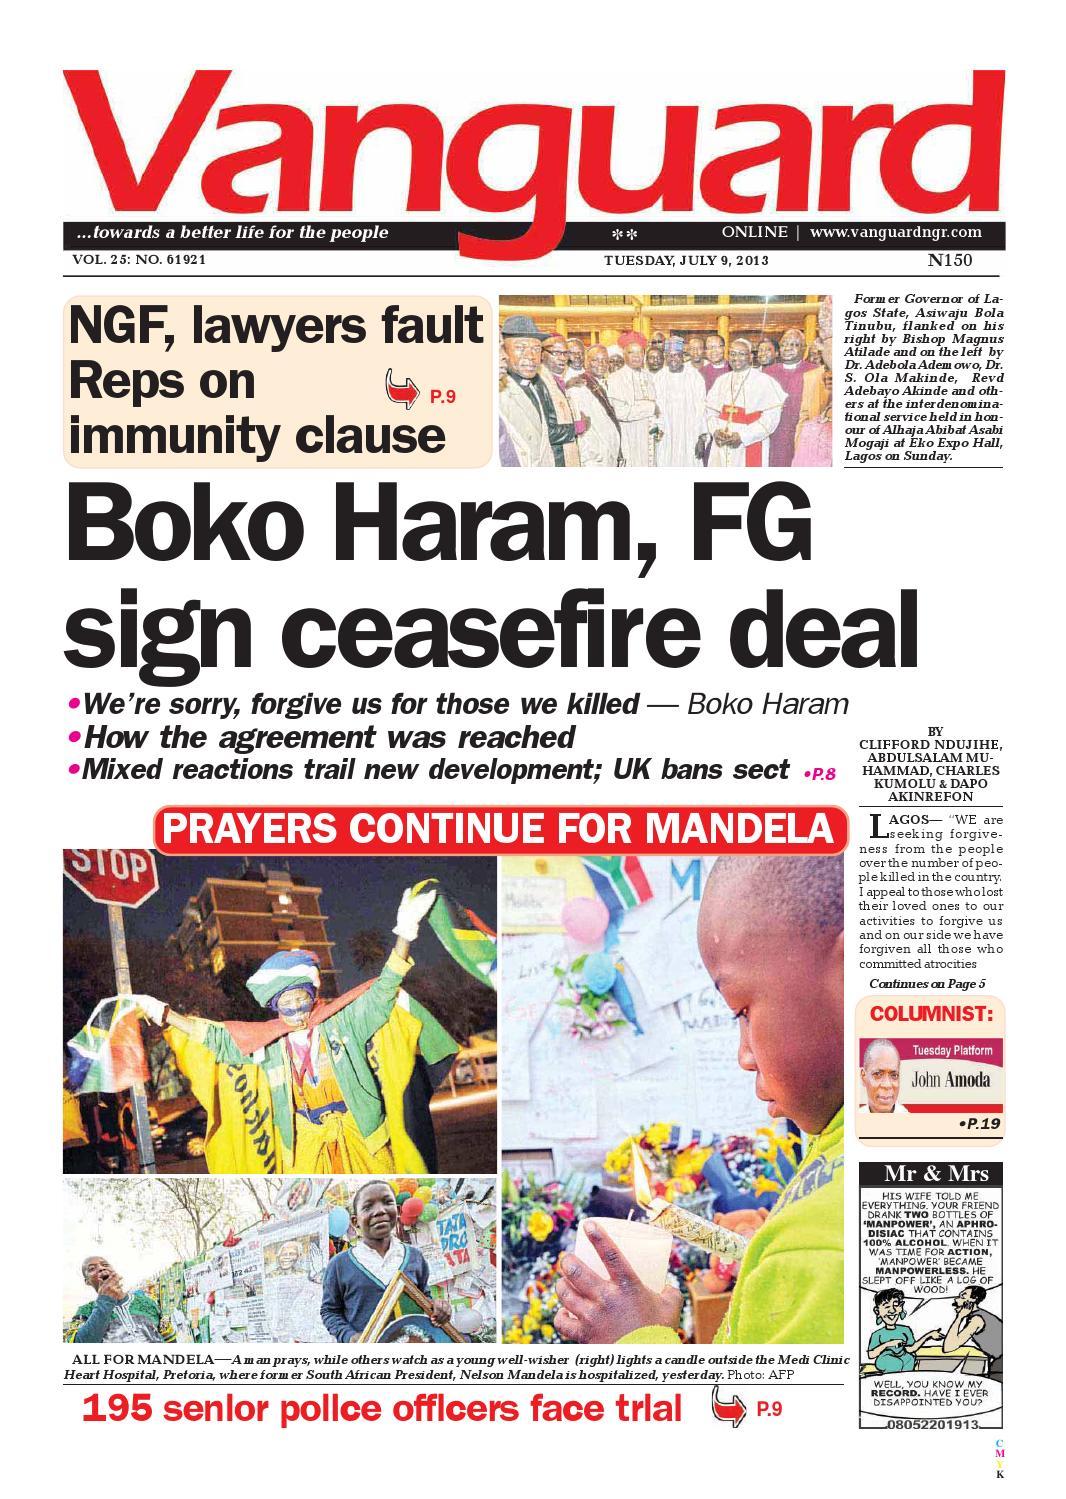 Boko Haram Fg Sign Ceasefire Deal By Vanguard Media Limited Issuu Tcash Ramadhan Milo Malaysia Activ Go